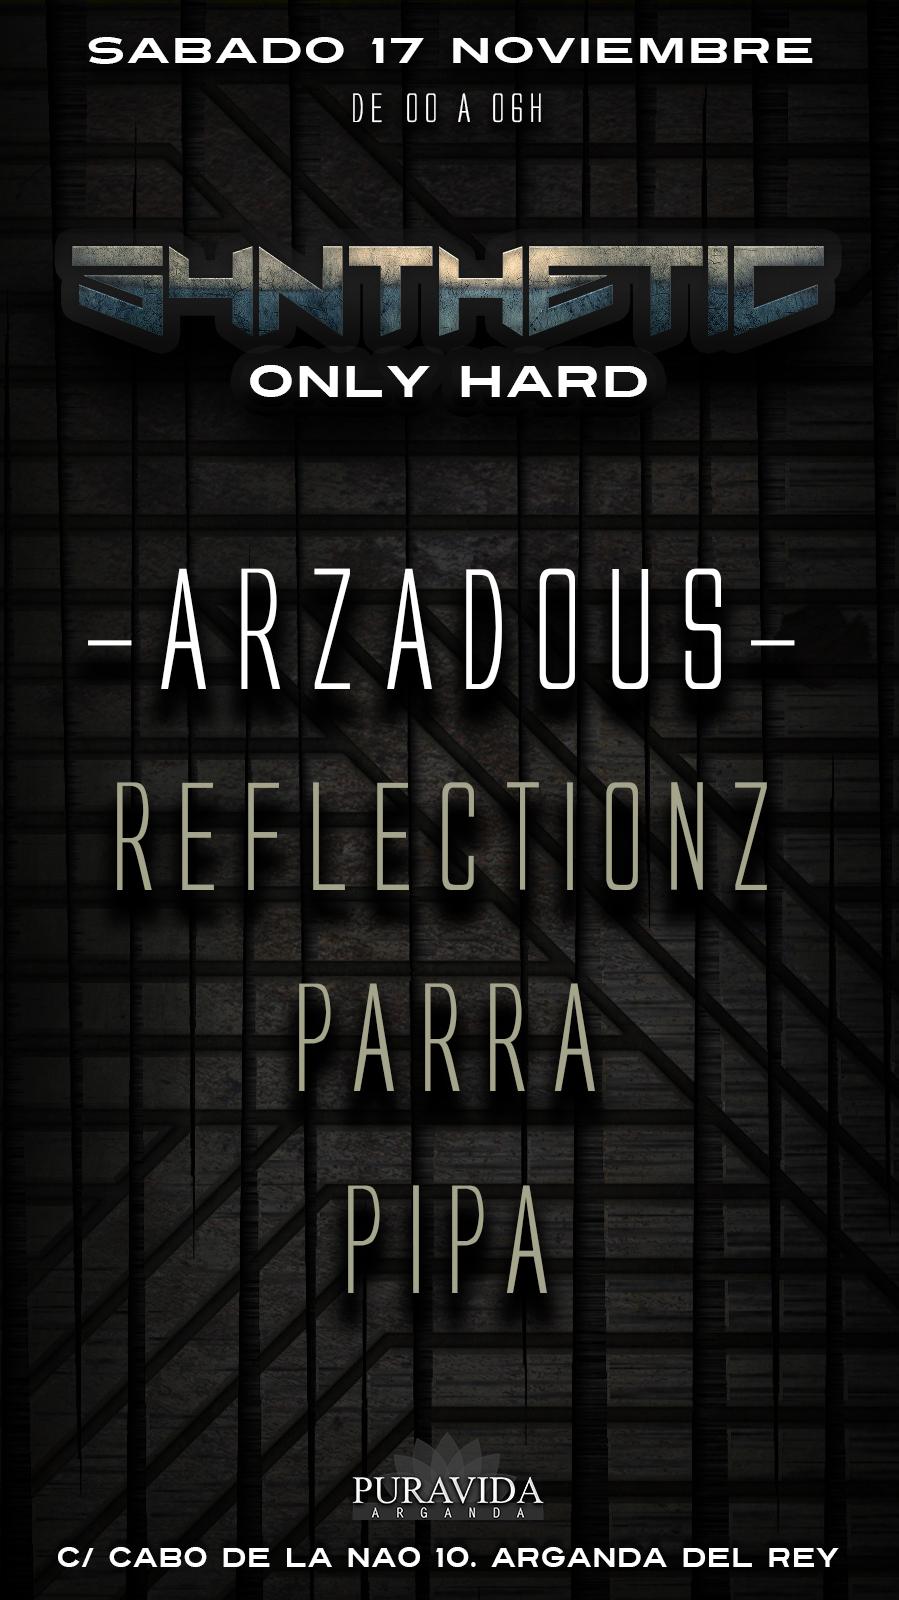 Puravida - Shynthetic Only Hard